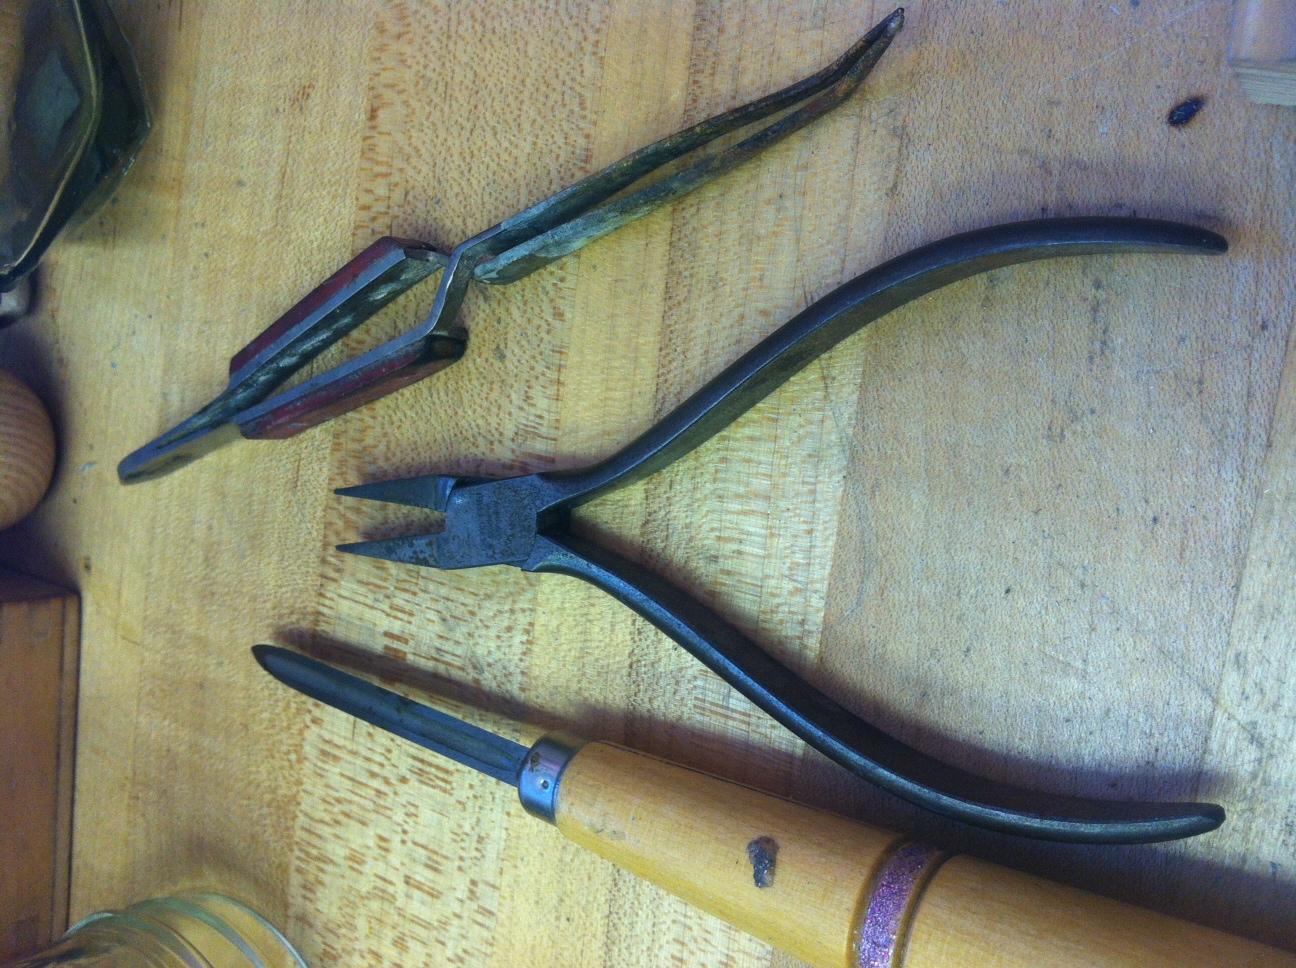 rusty tools - before image.JPG